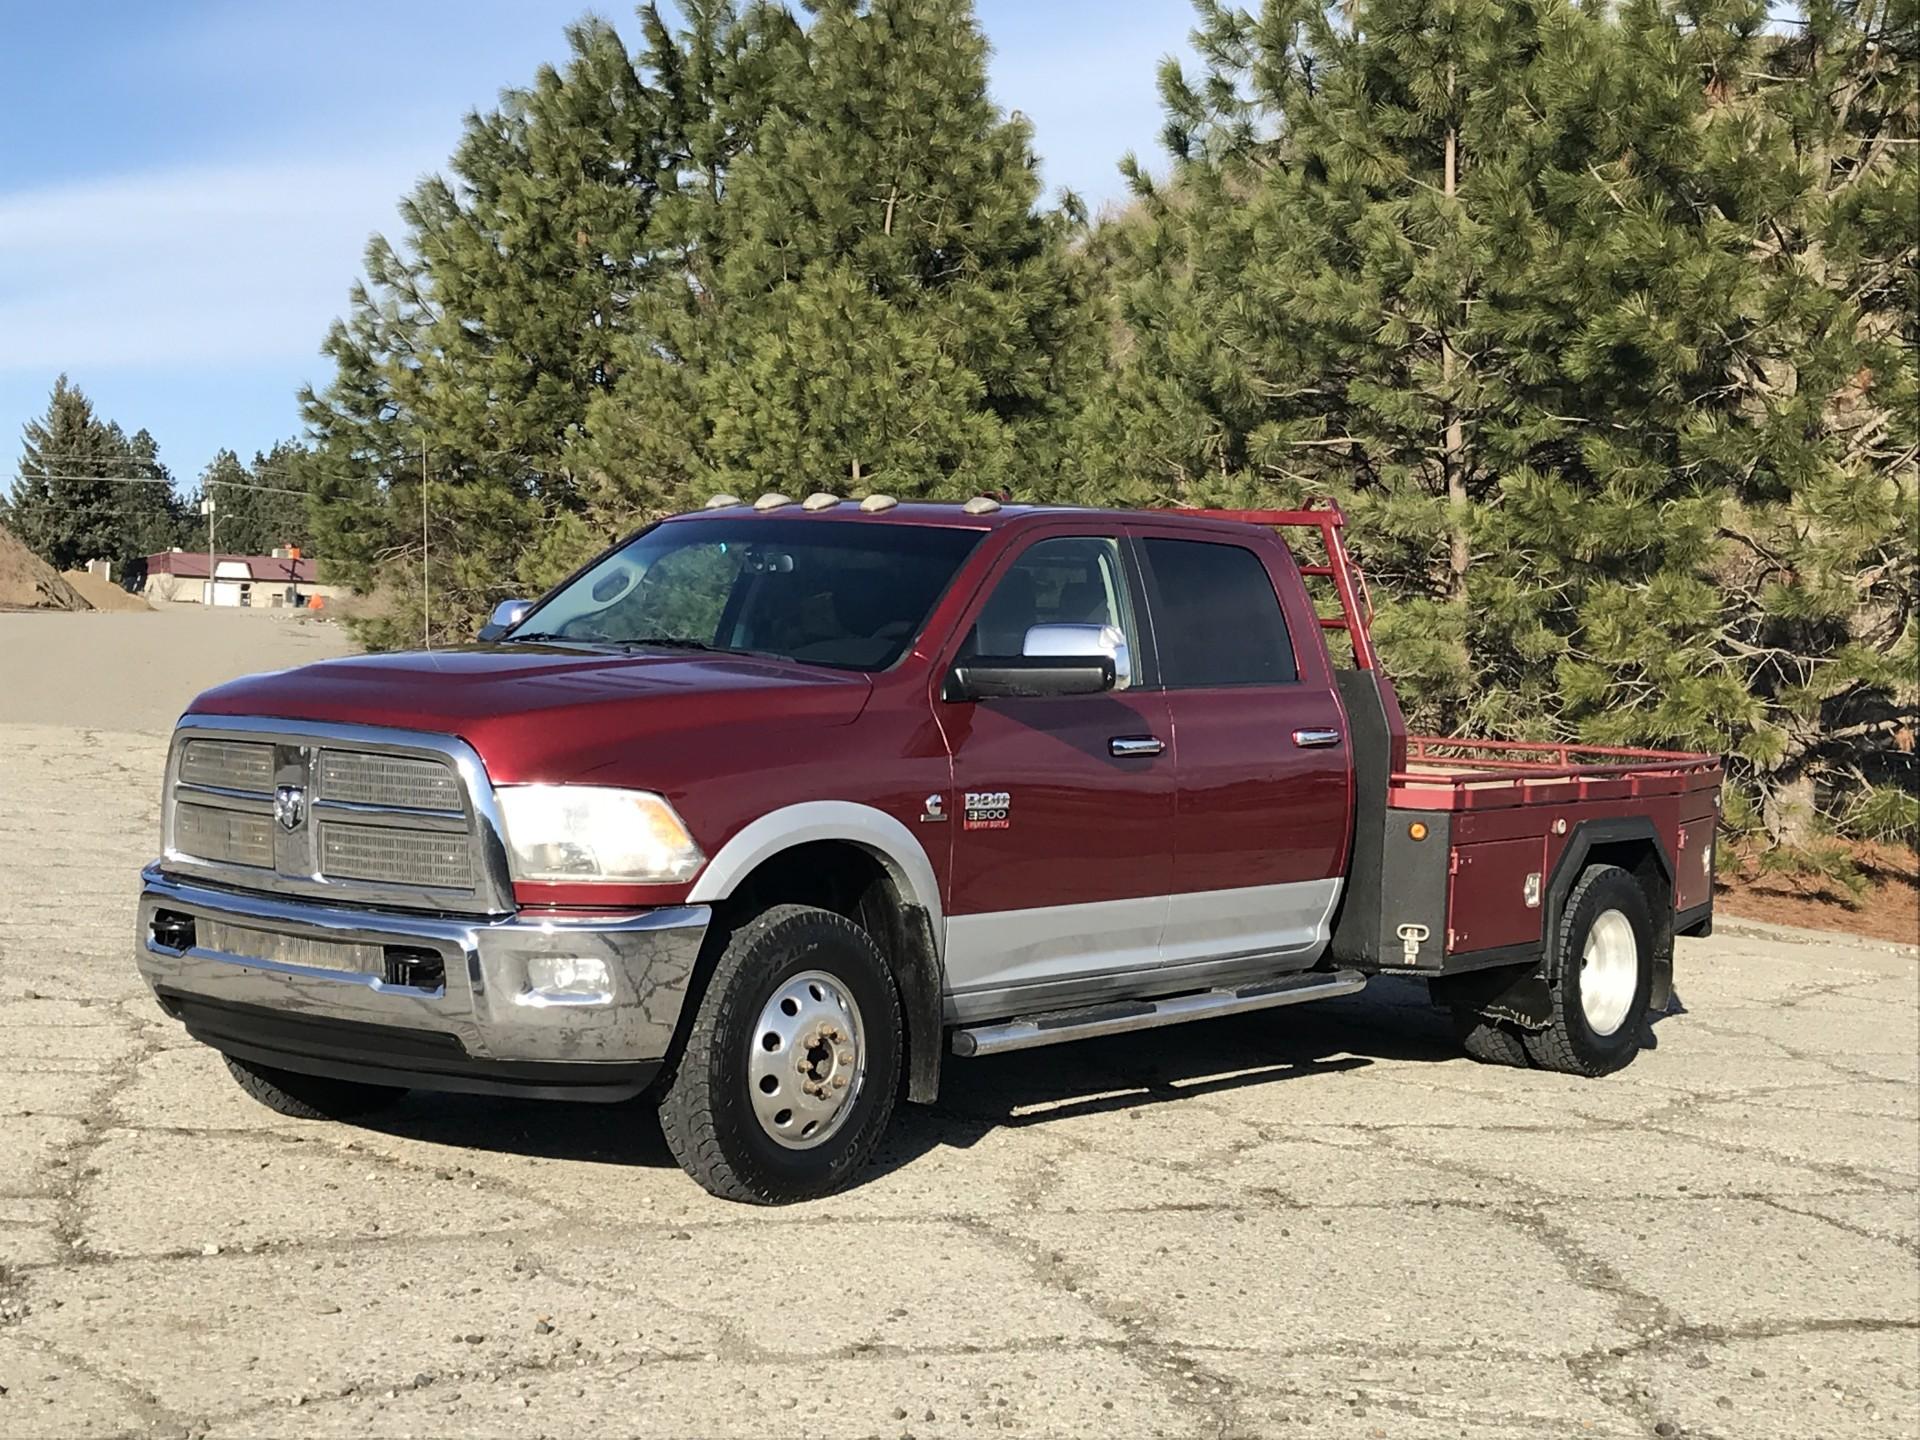 2012 Dodge Ram 3500 Flatbed